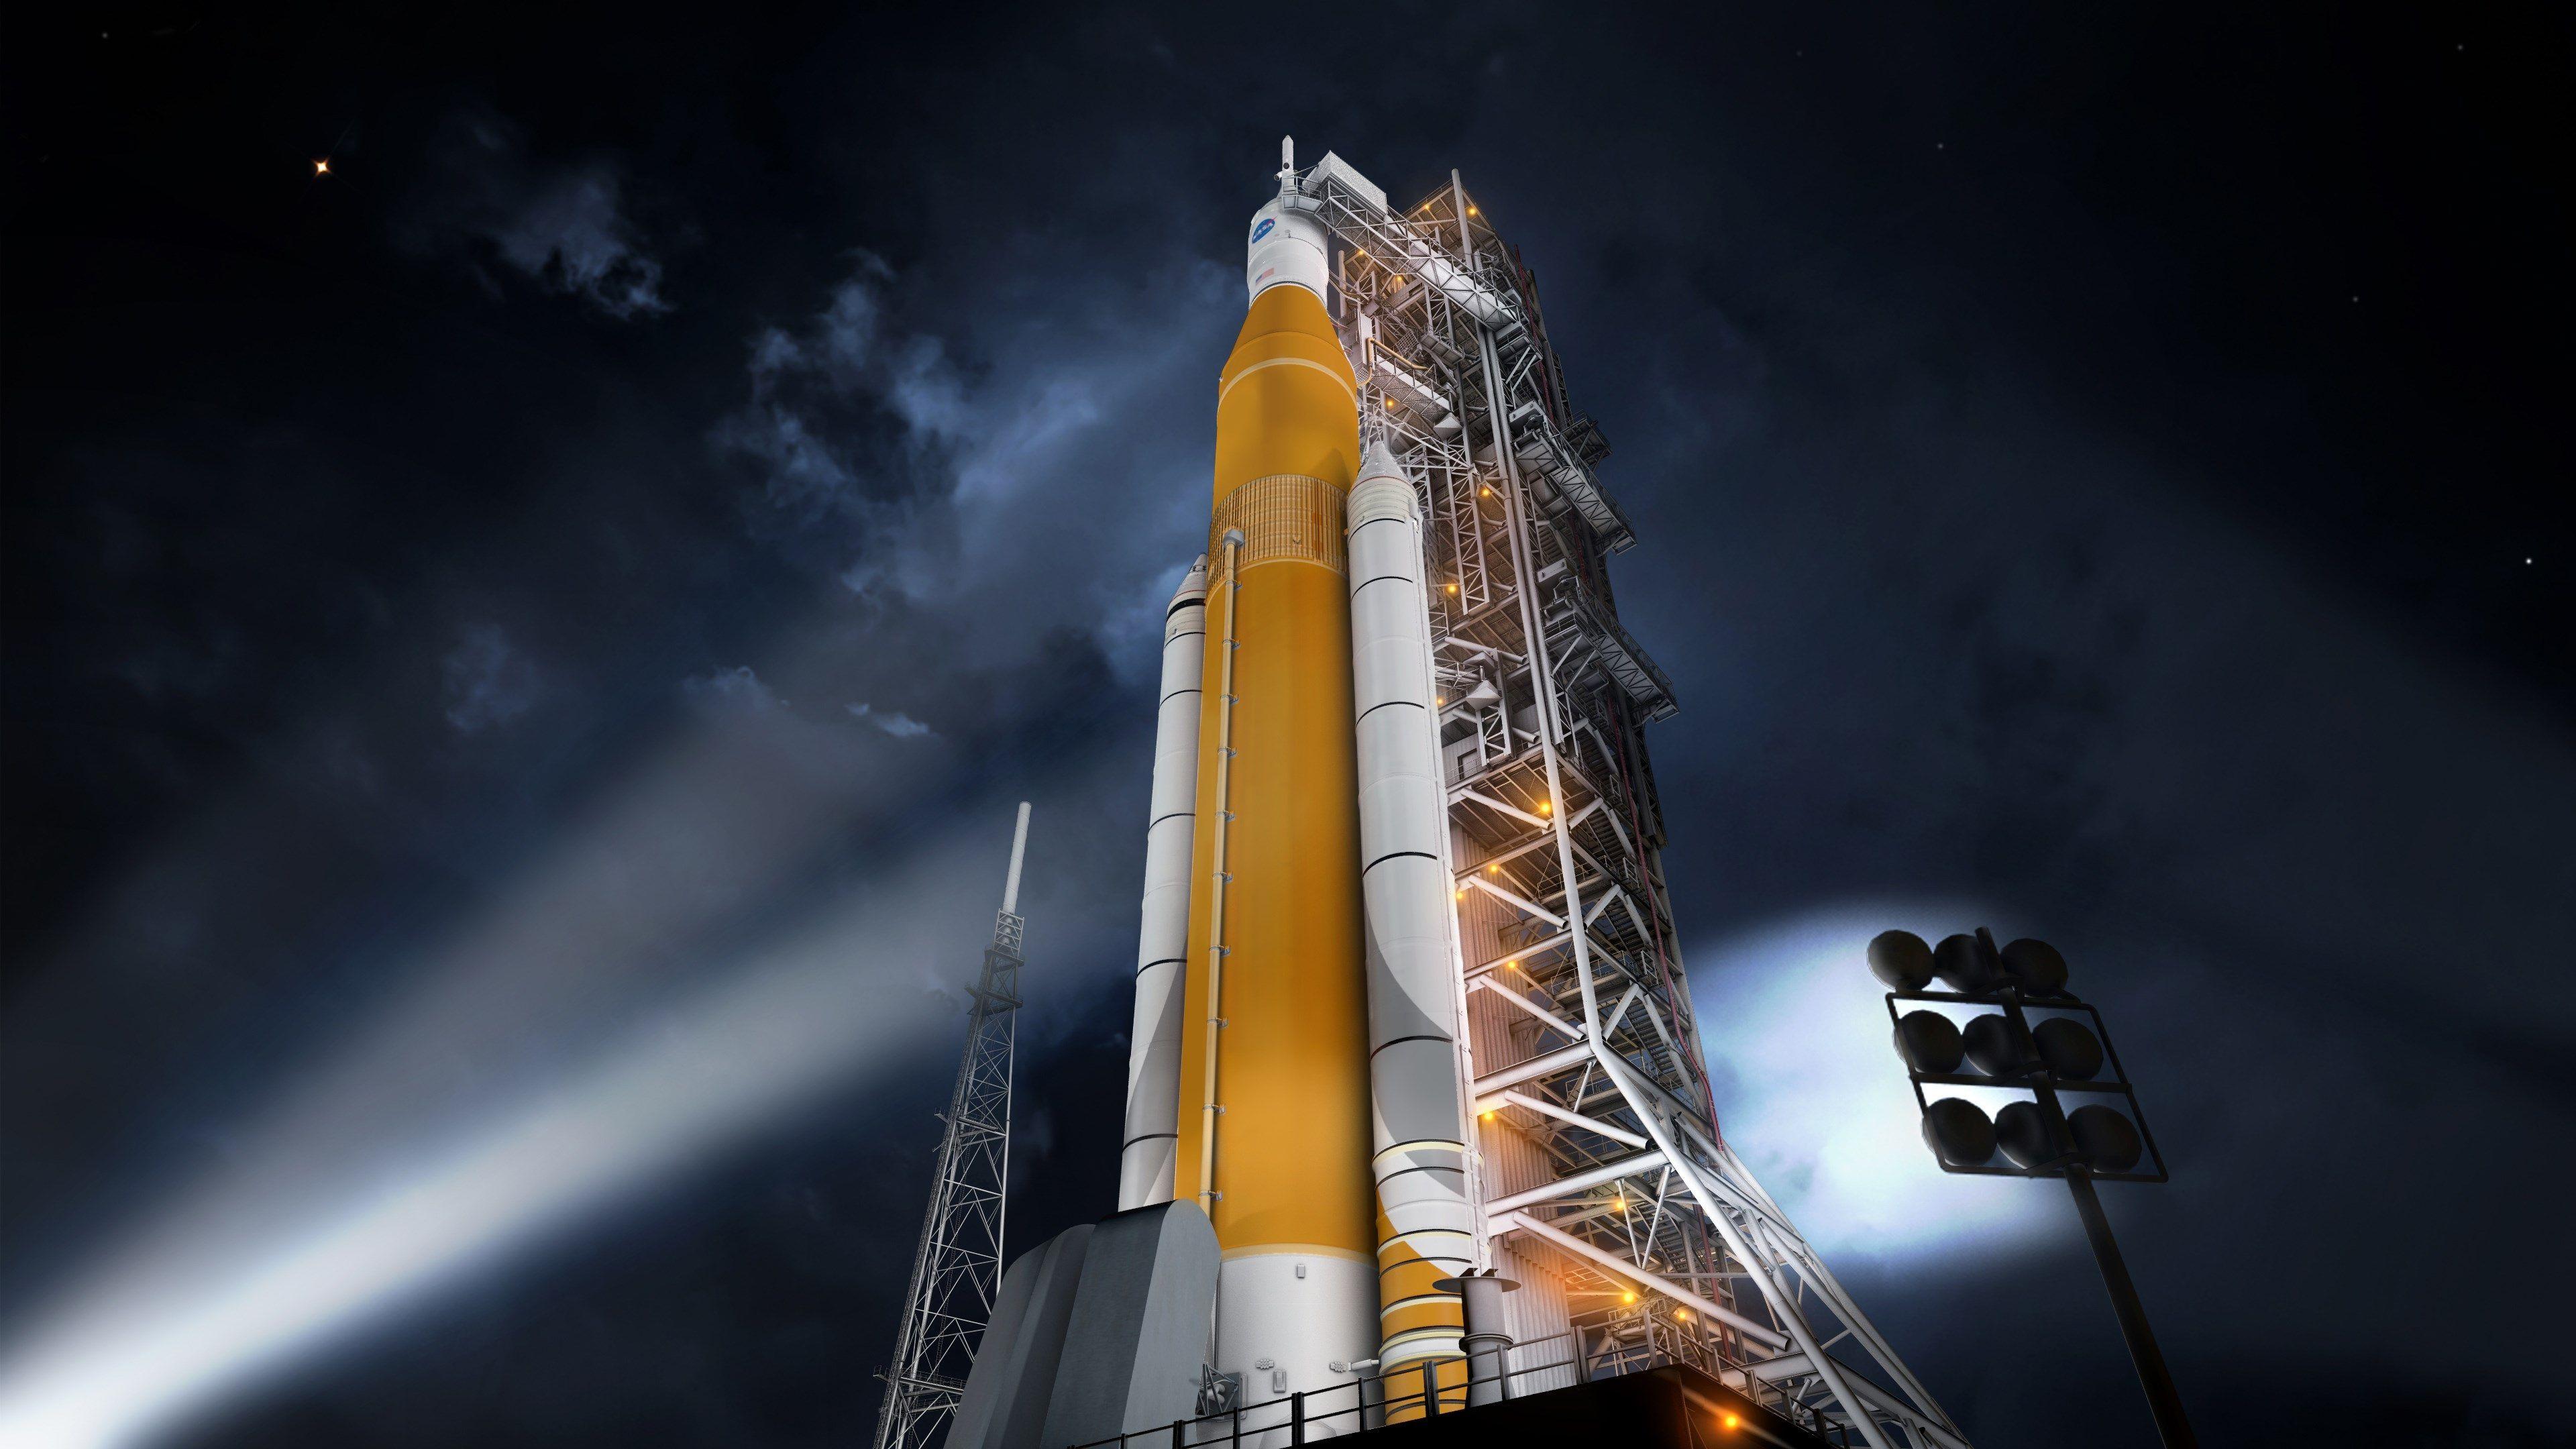 3840x2160 nasa space launch system 4k ultra hd desktop